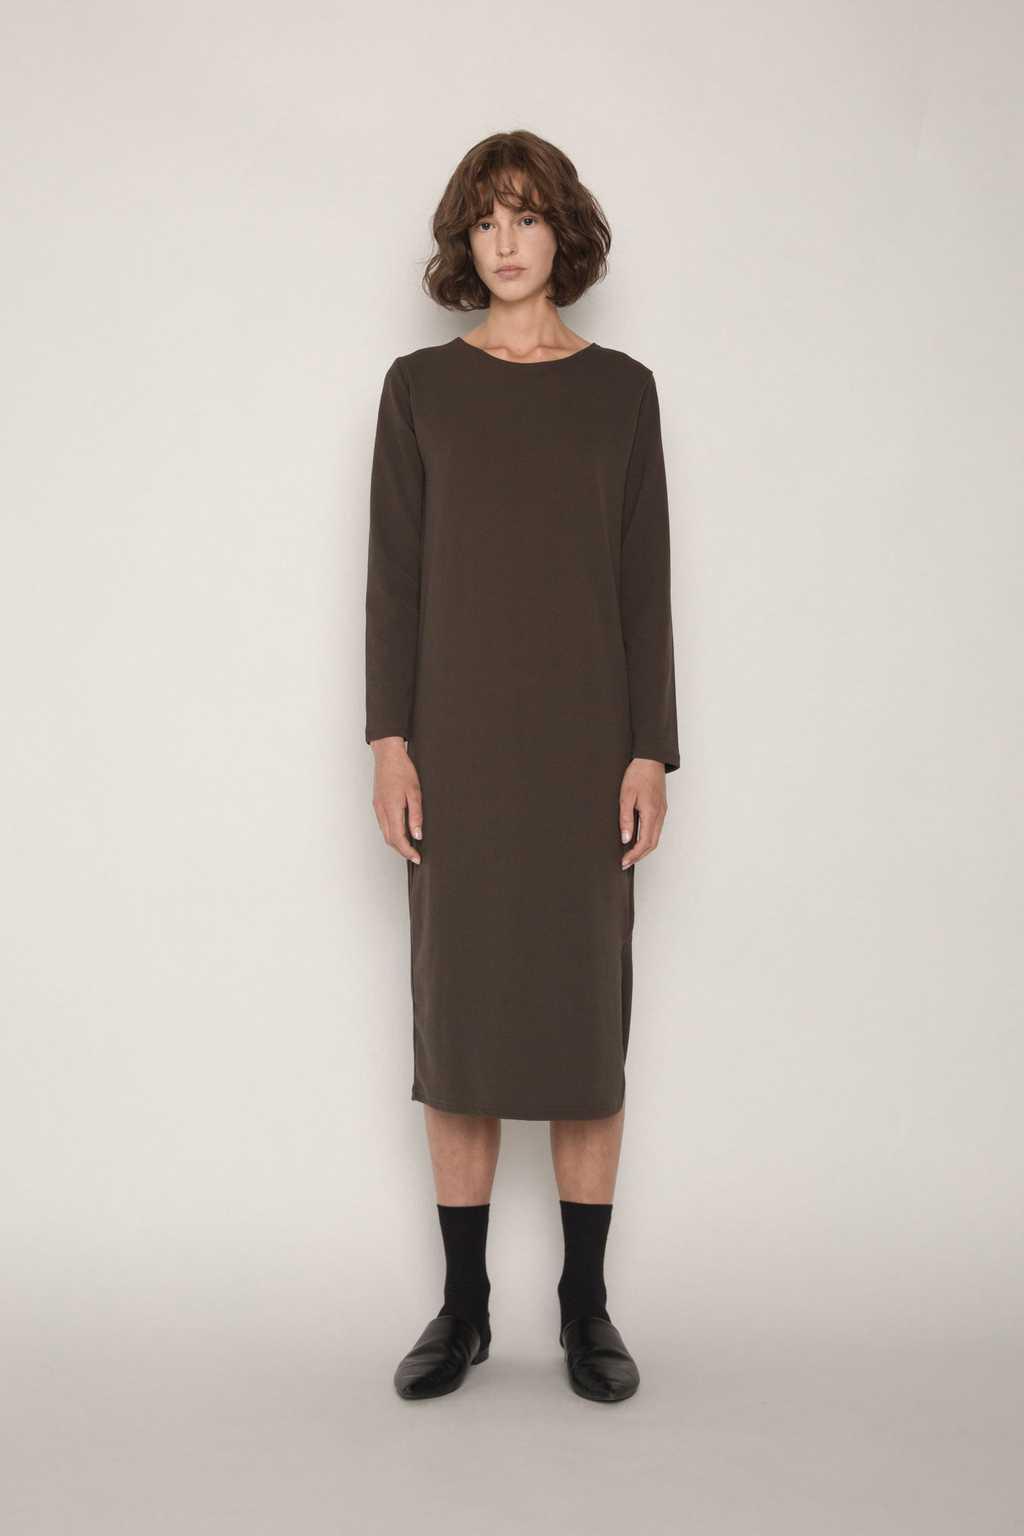 Dress H256 Olive 2